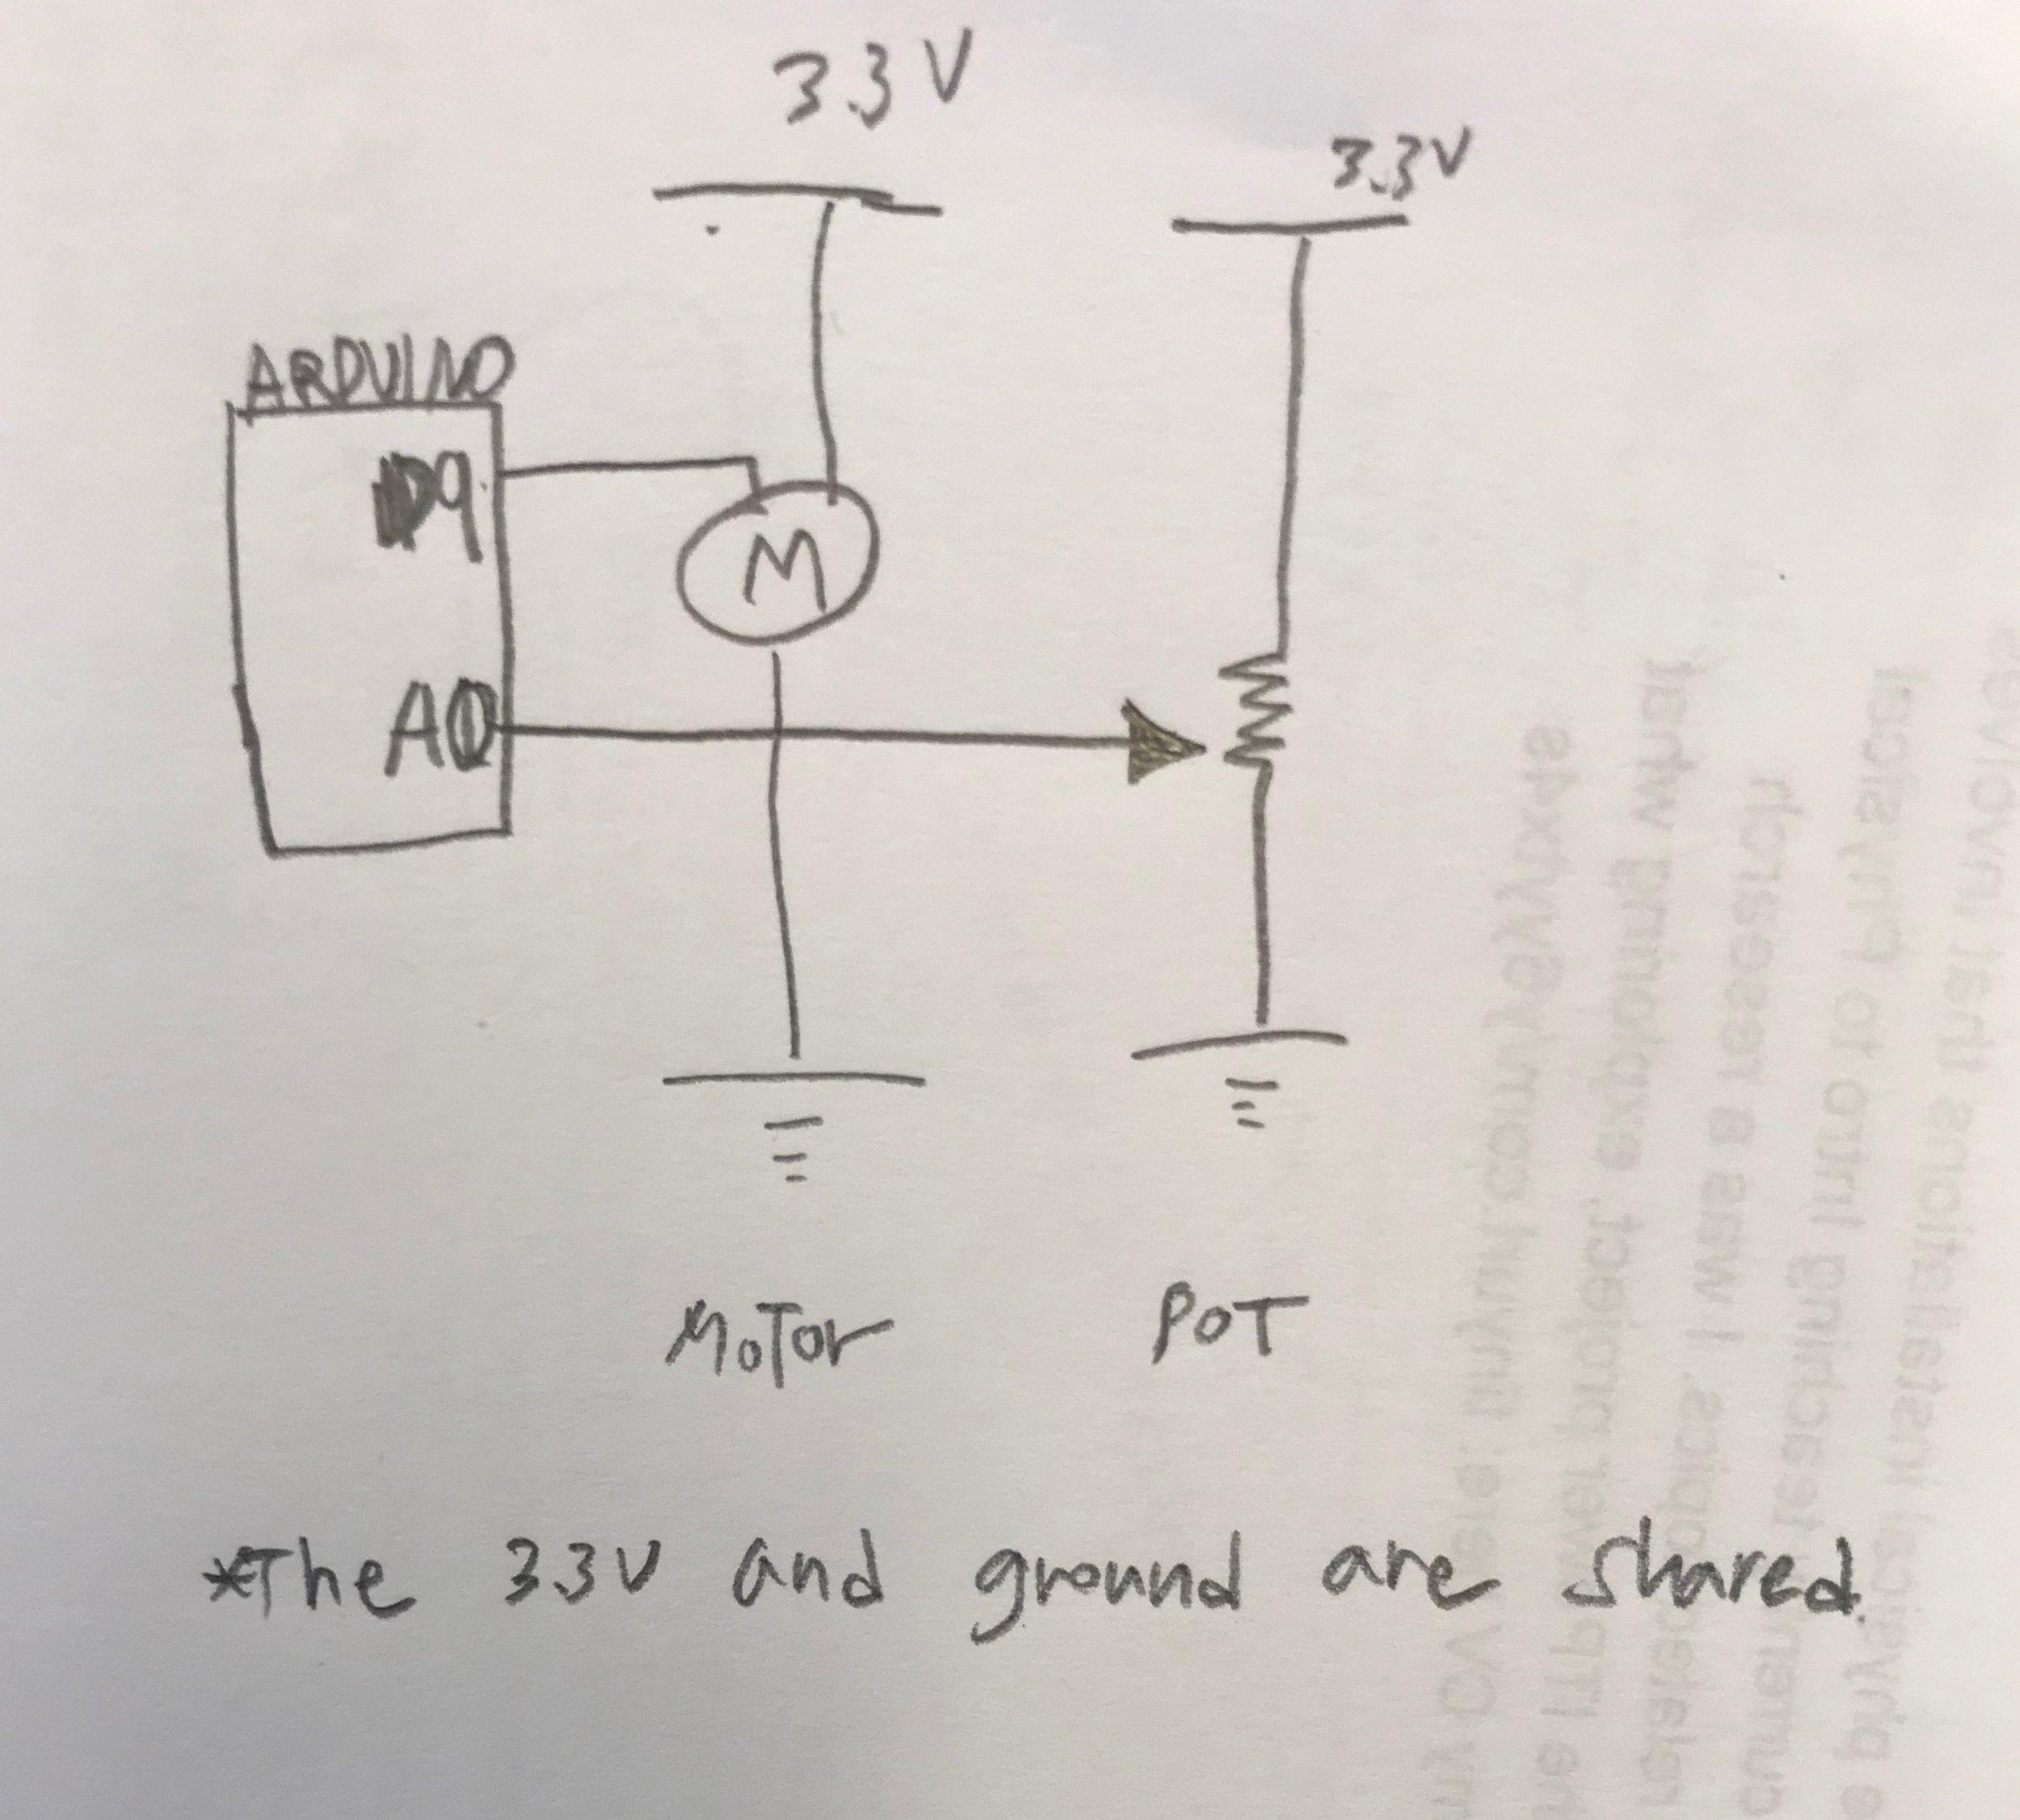 servo_and_pot_schematics.jpeg